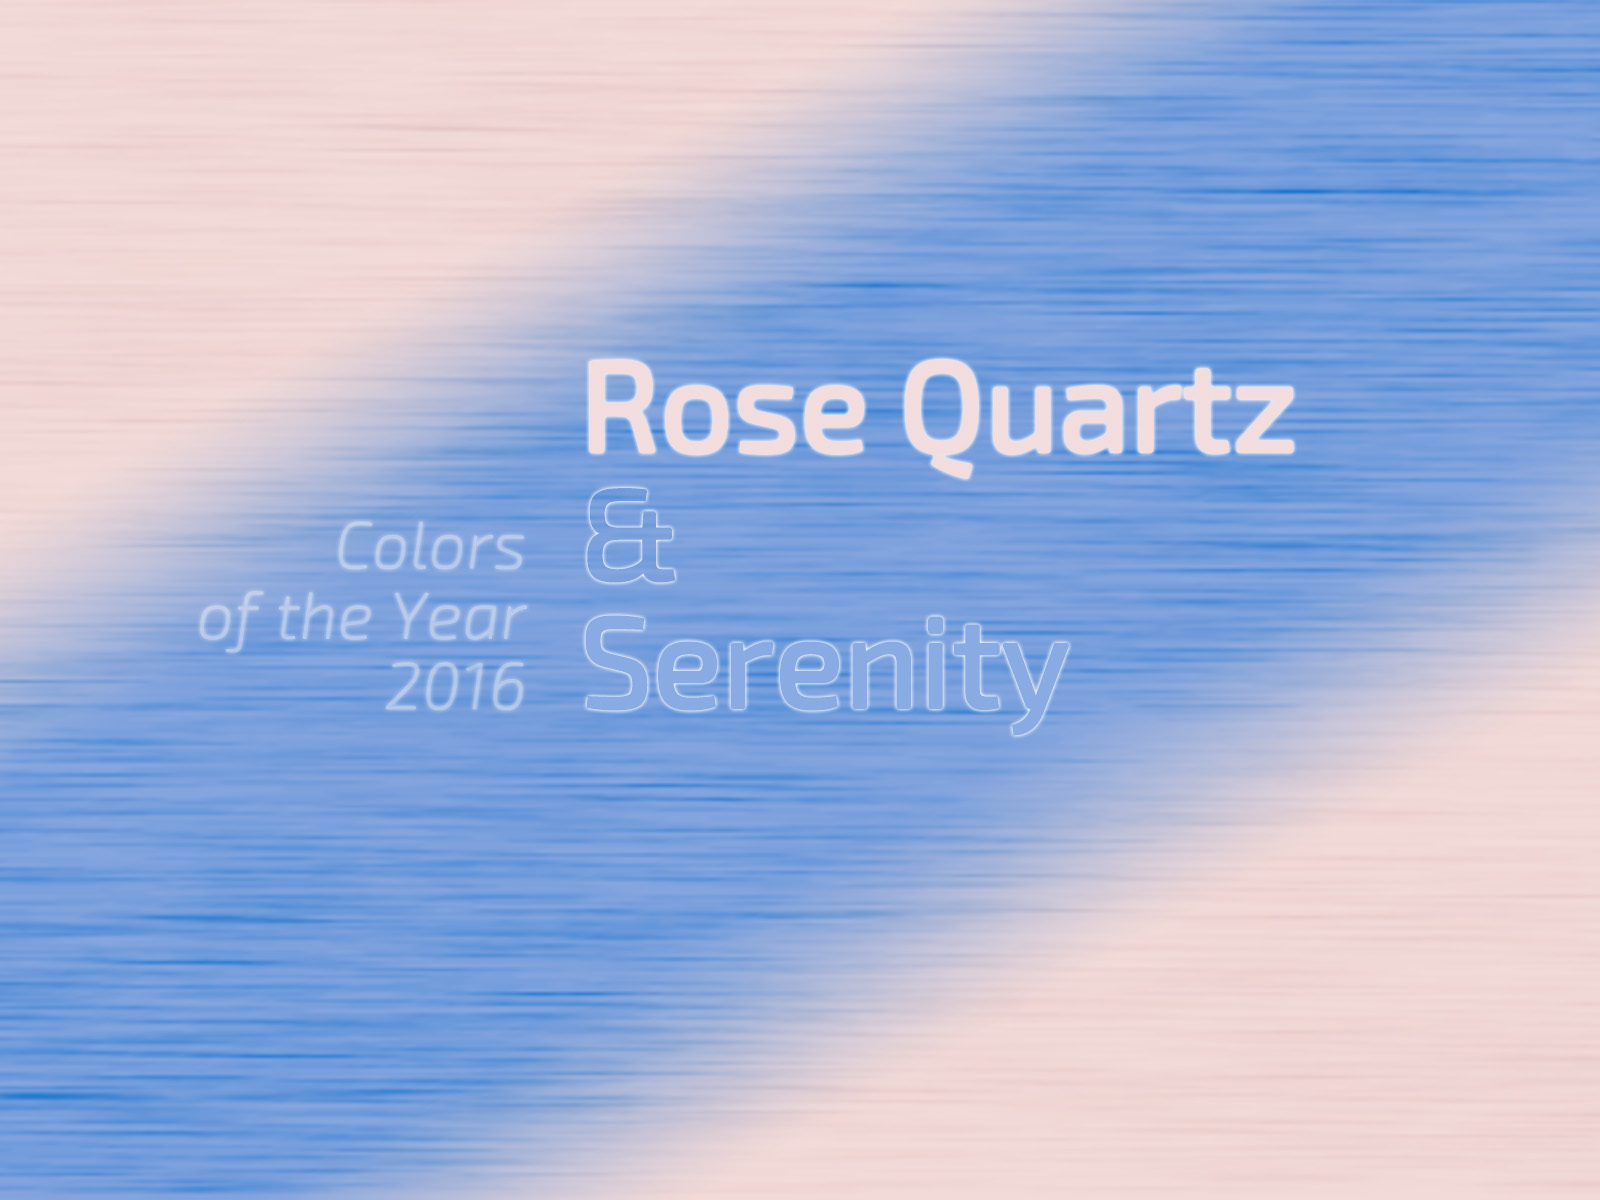 Rose Quartz Serenity 006 Hintergrundbild